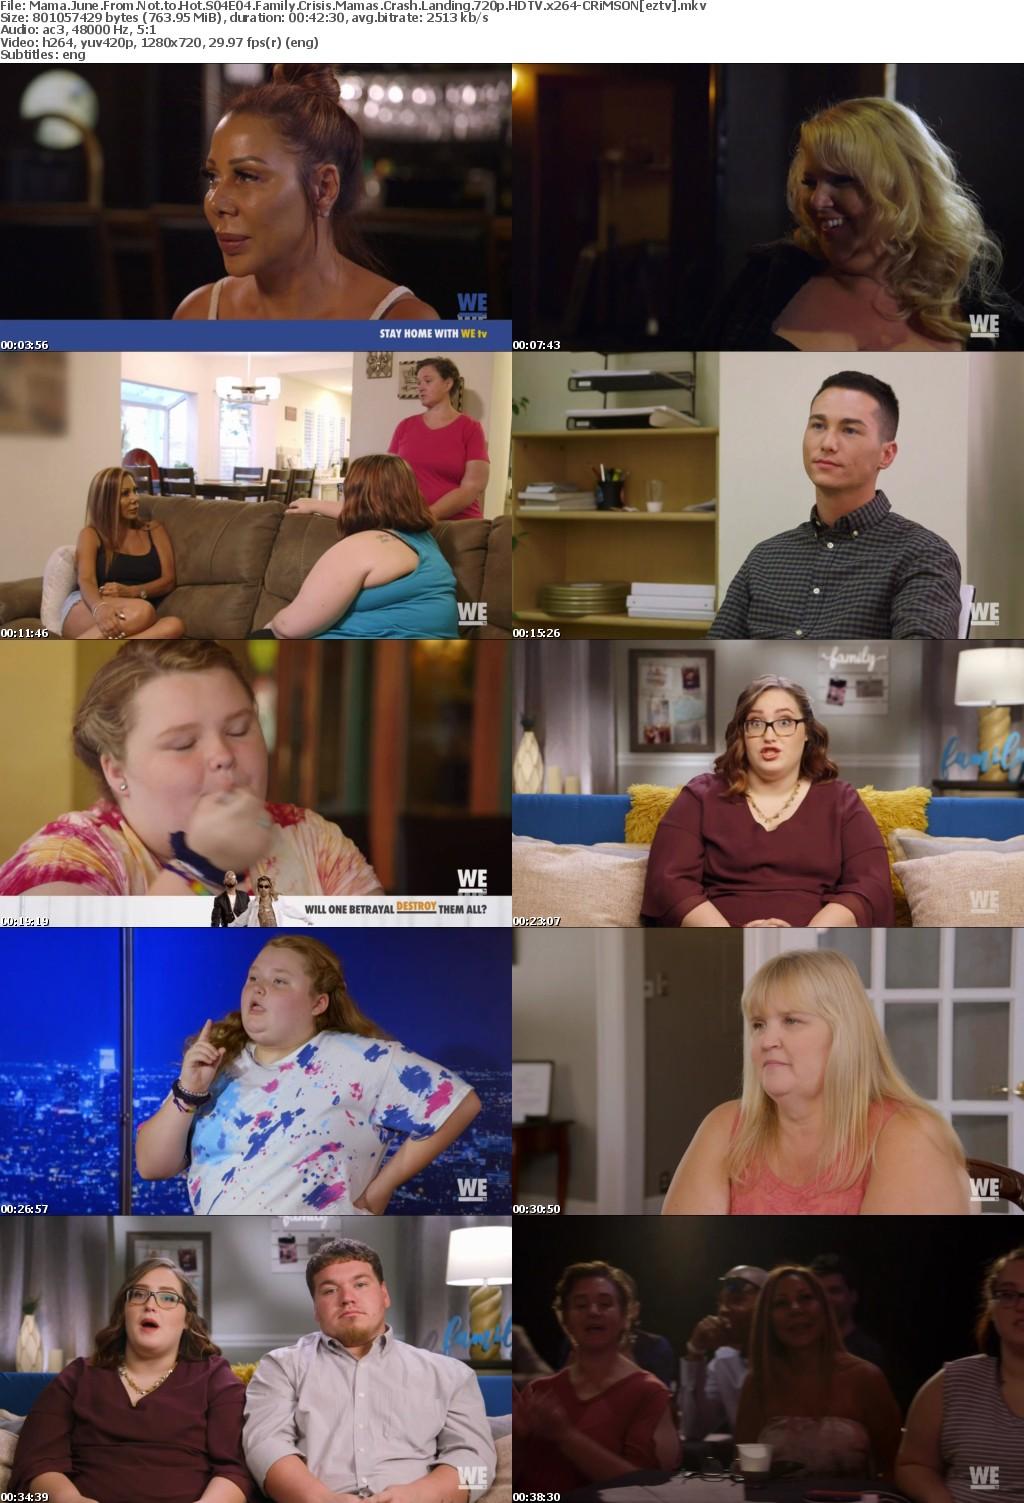 Mama June From Not to Hot S04E04 Family Crisis Mamas Crash Landing 720p HDTV x264-CRiMSON